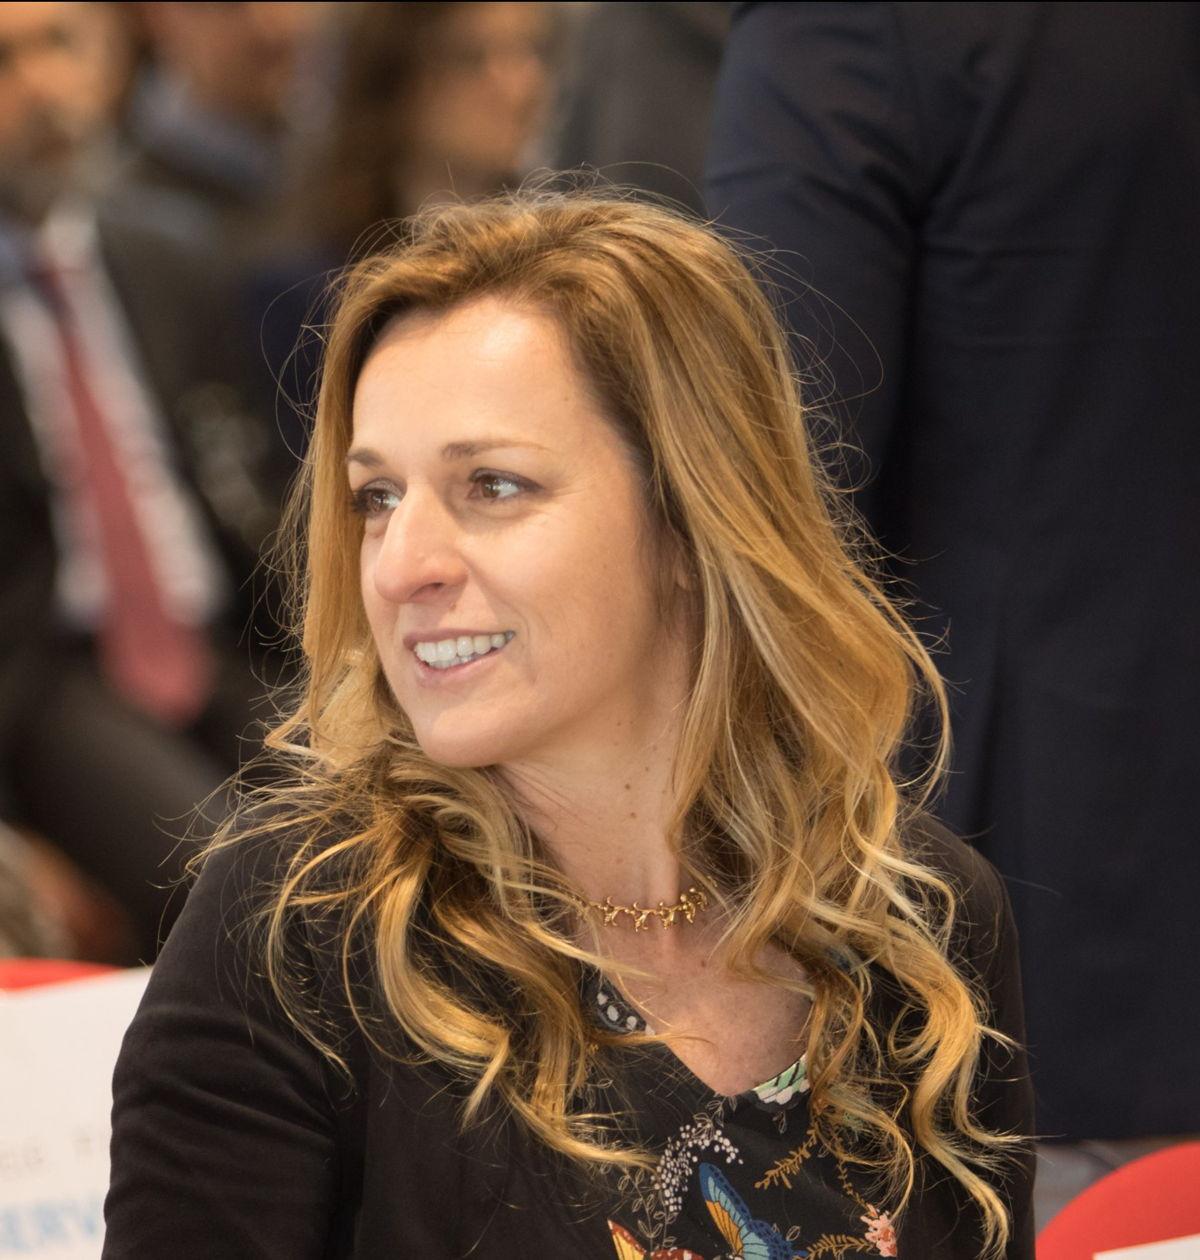 Maria Cristina Poggesi, IPPR